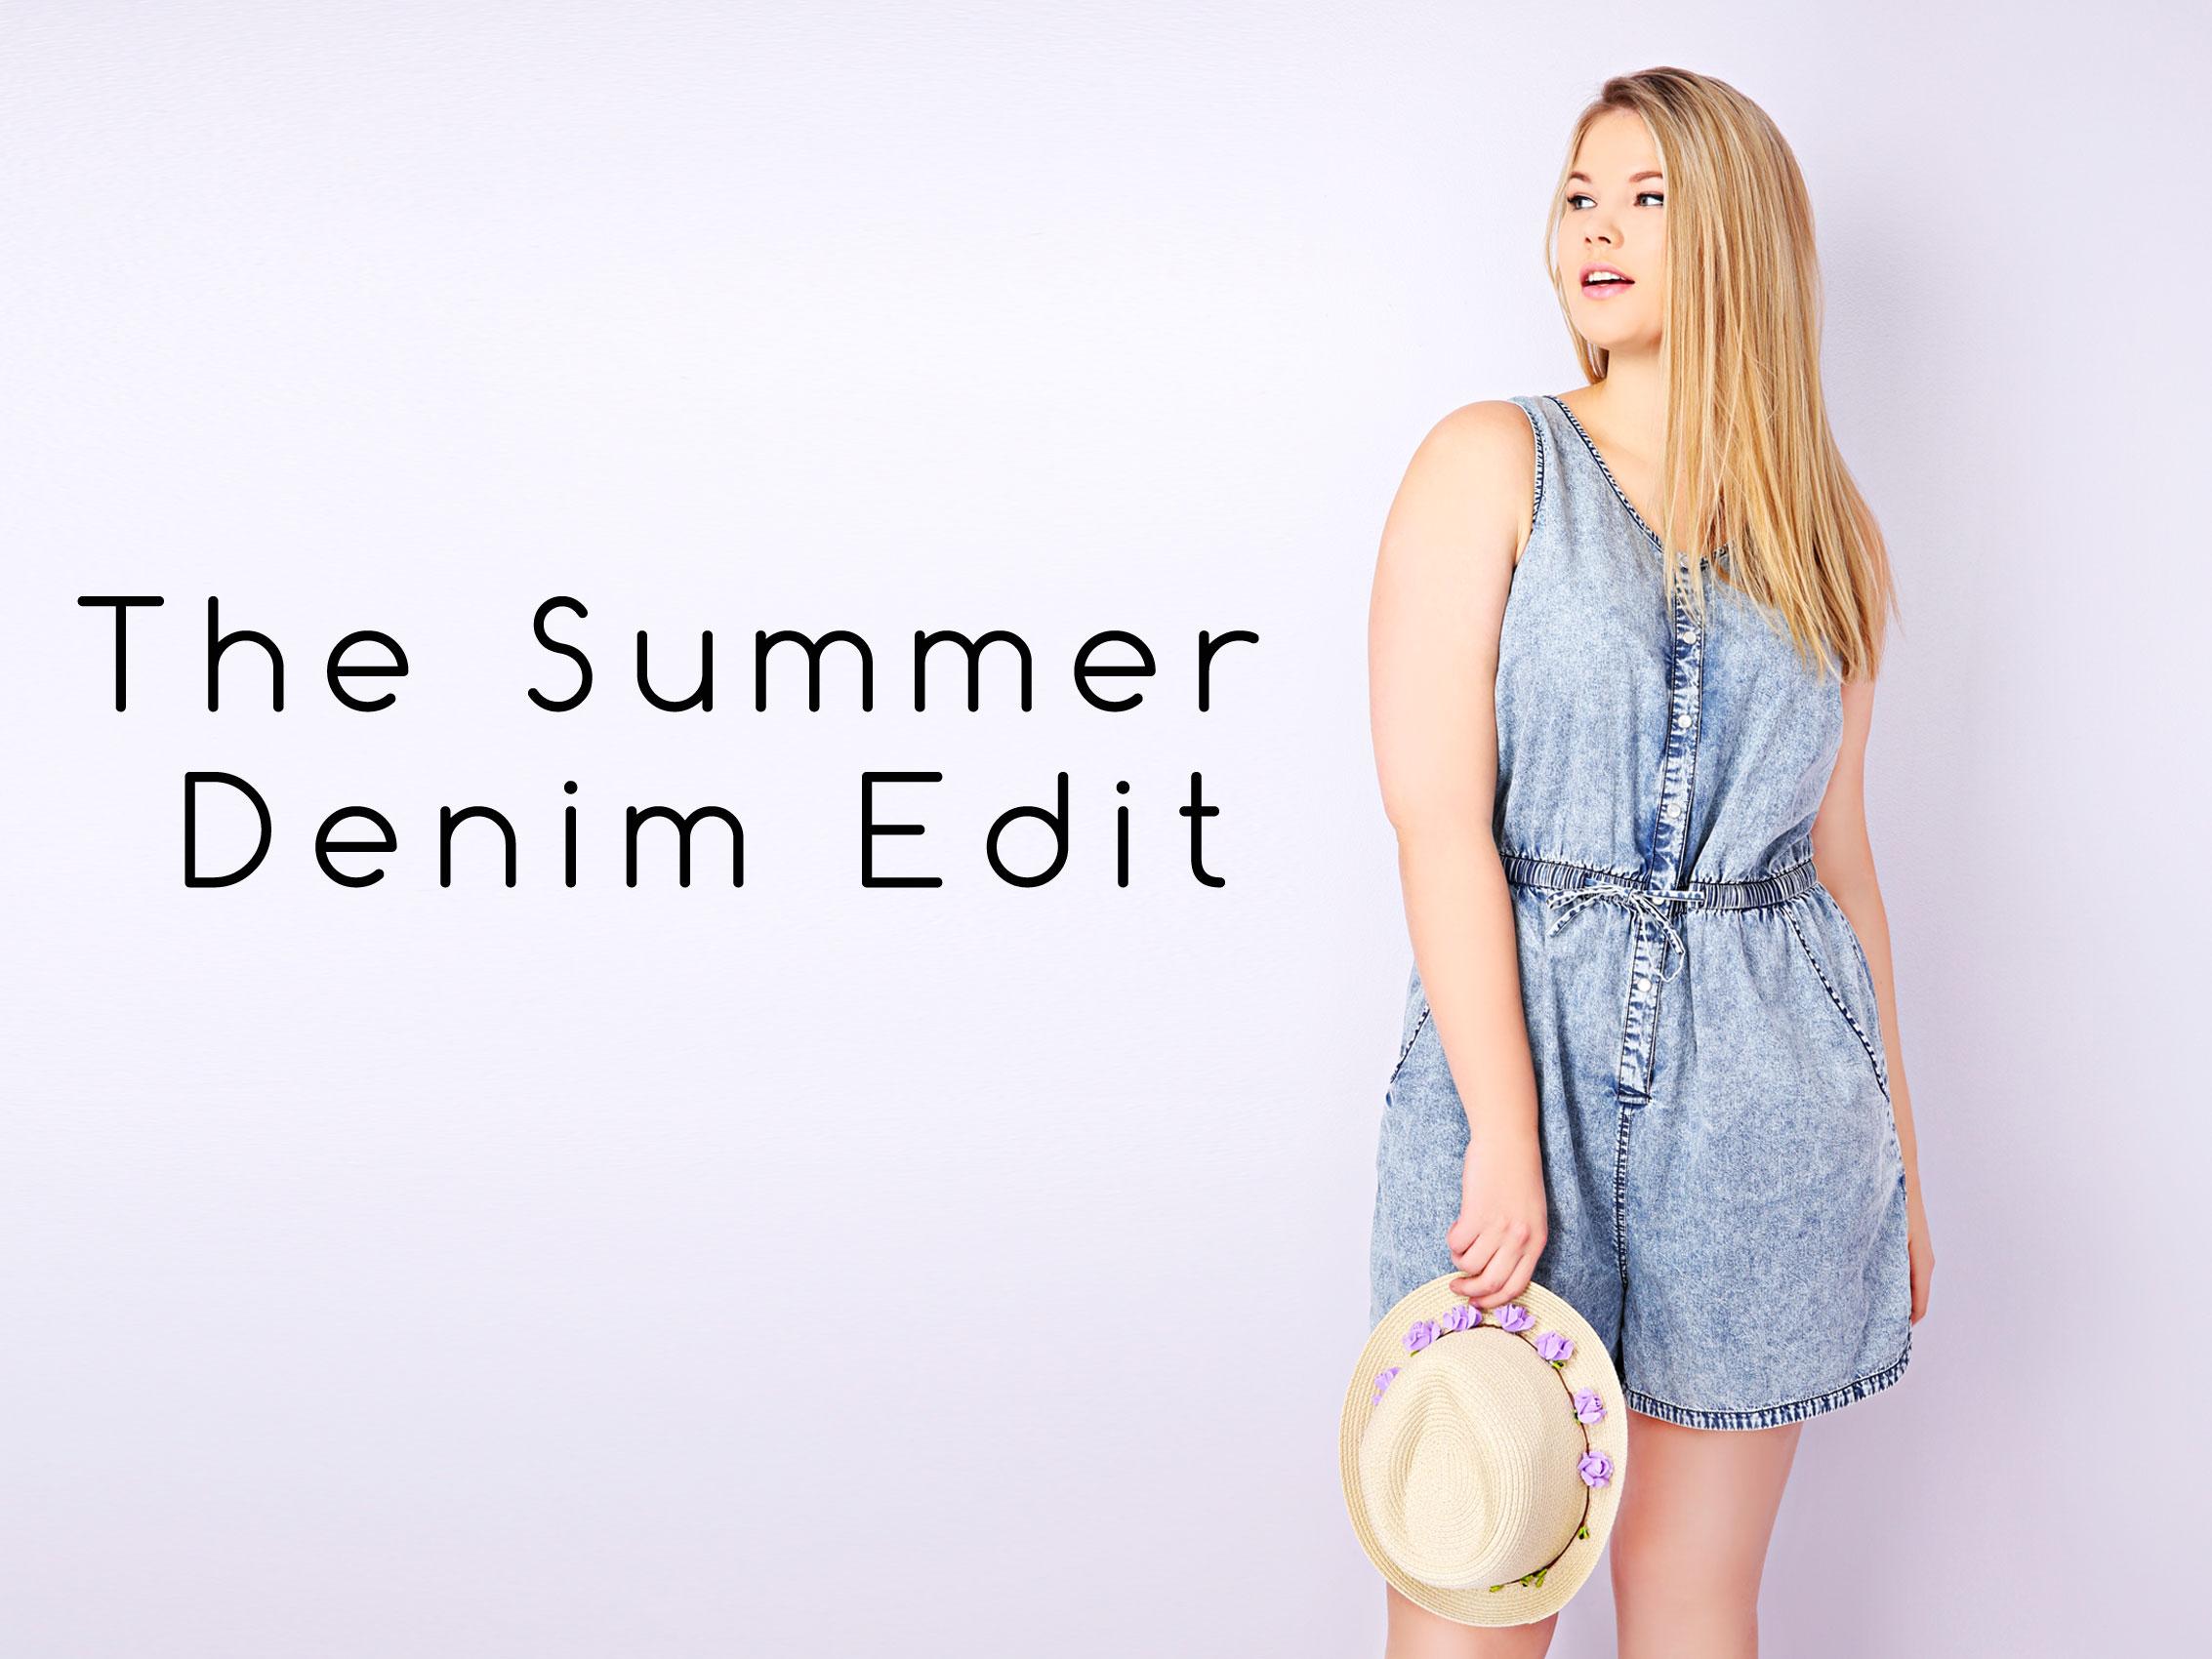 The Summer Denim Edit